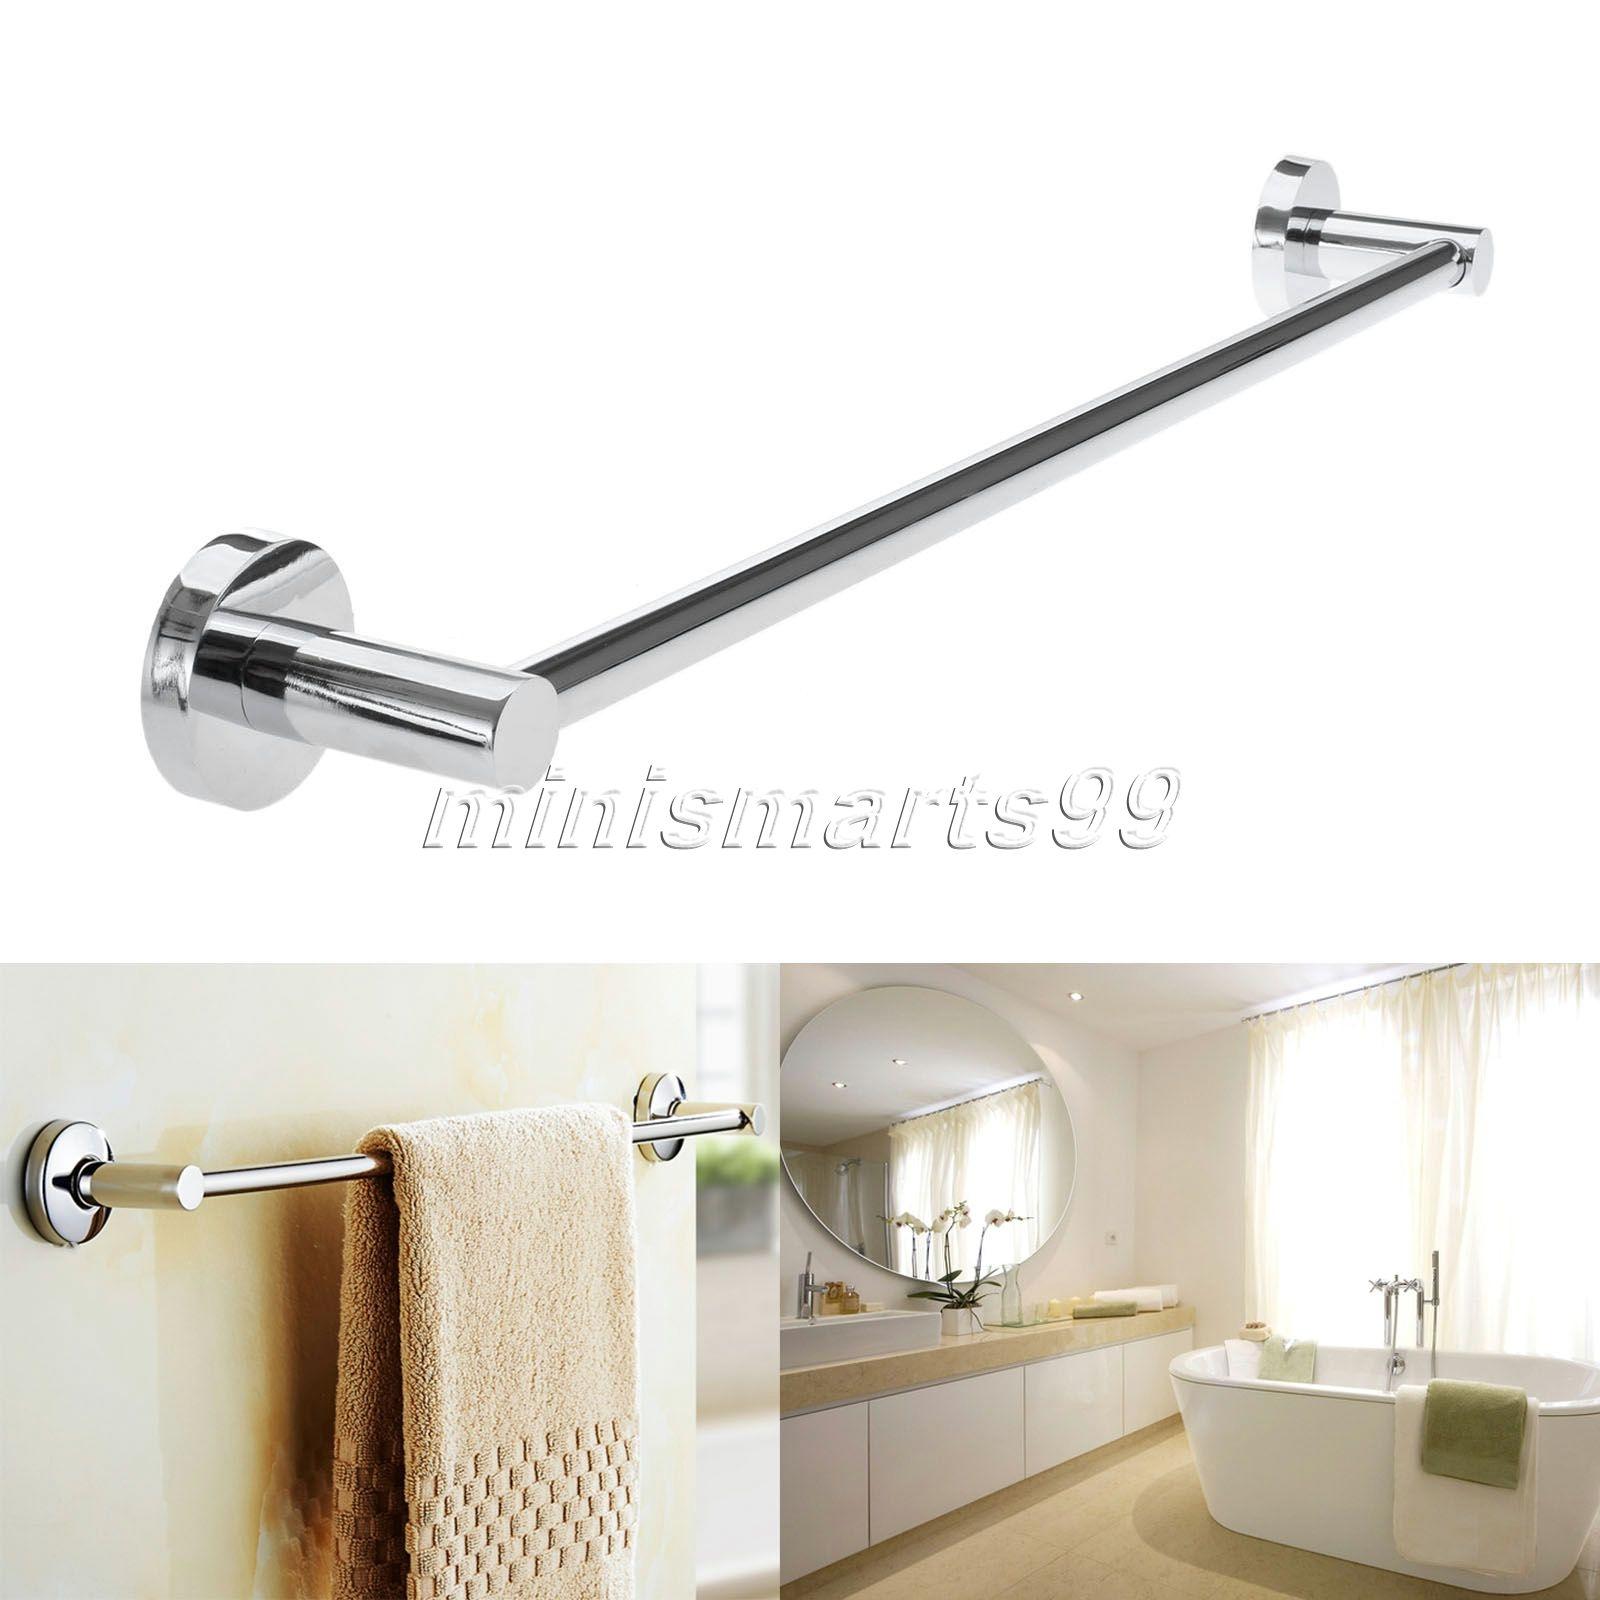 small bathroom towel storage towel rack bathroom ideas bathroom hand towel  holder rack storage for small